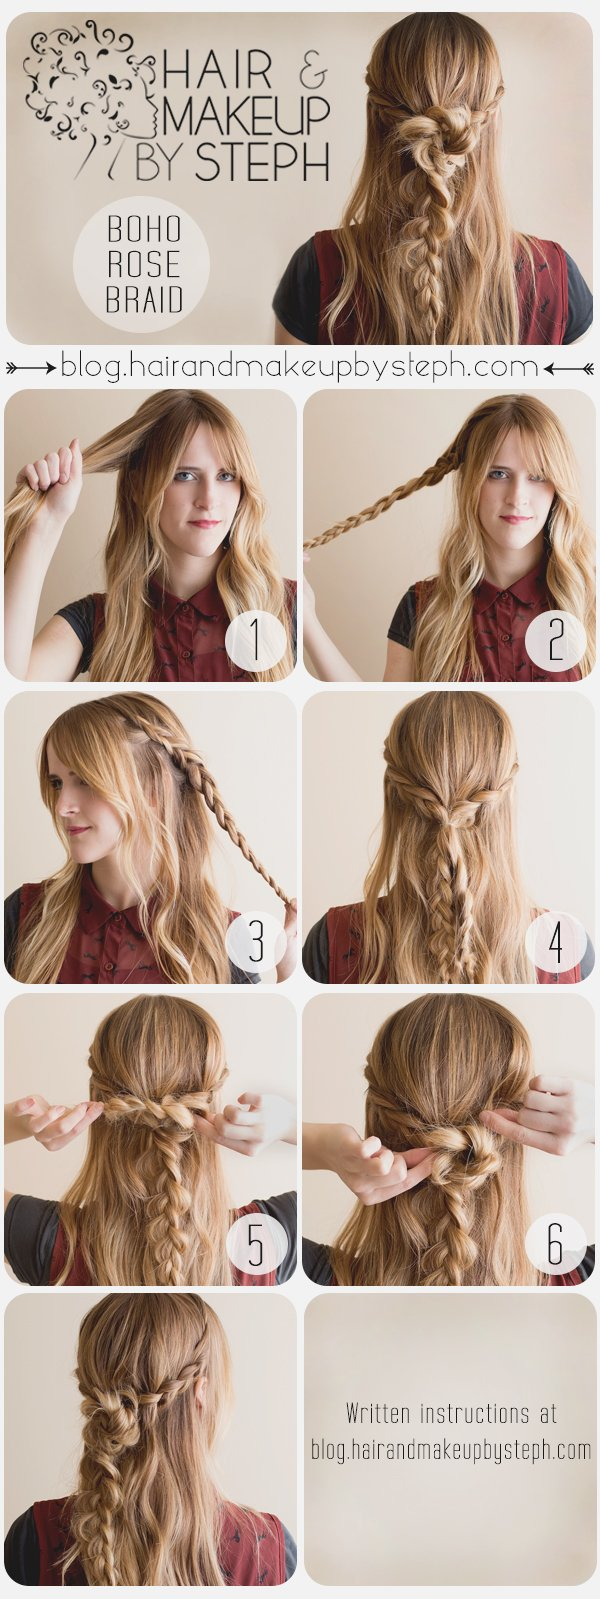 Beautiful Boho Rose Braid Hairstyle Tutorial